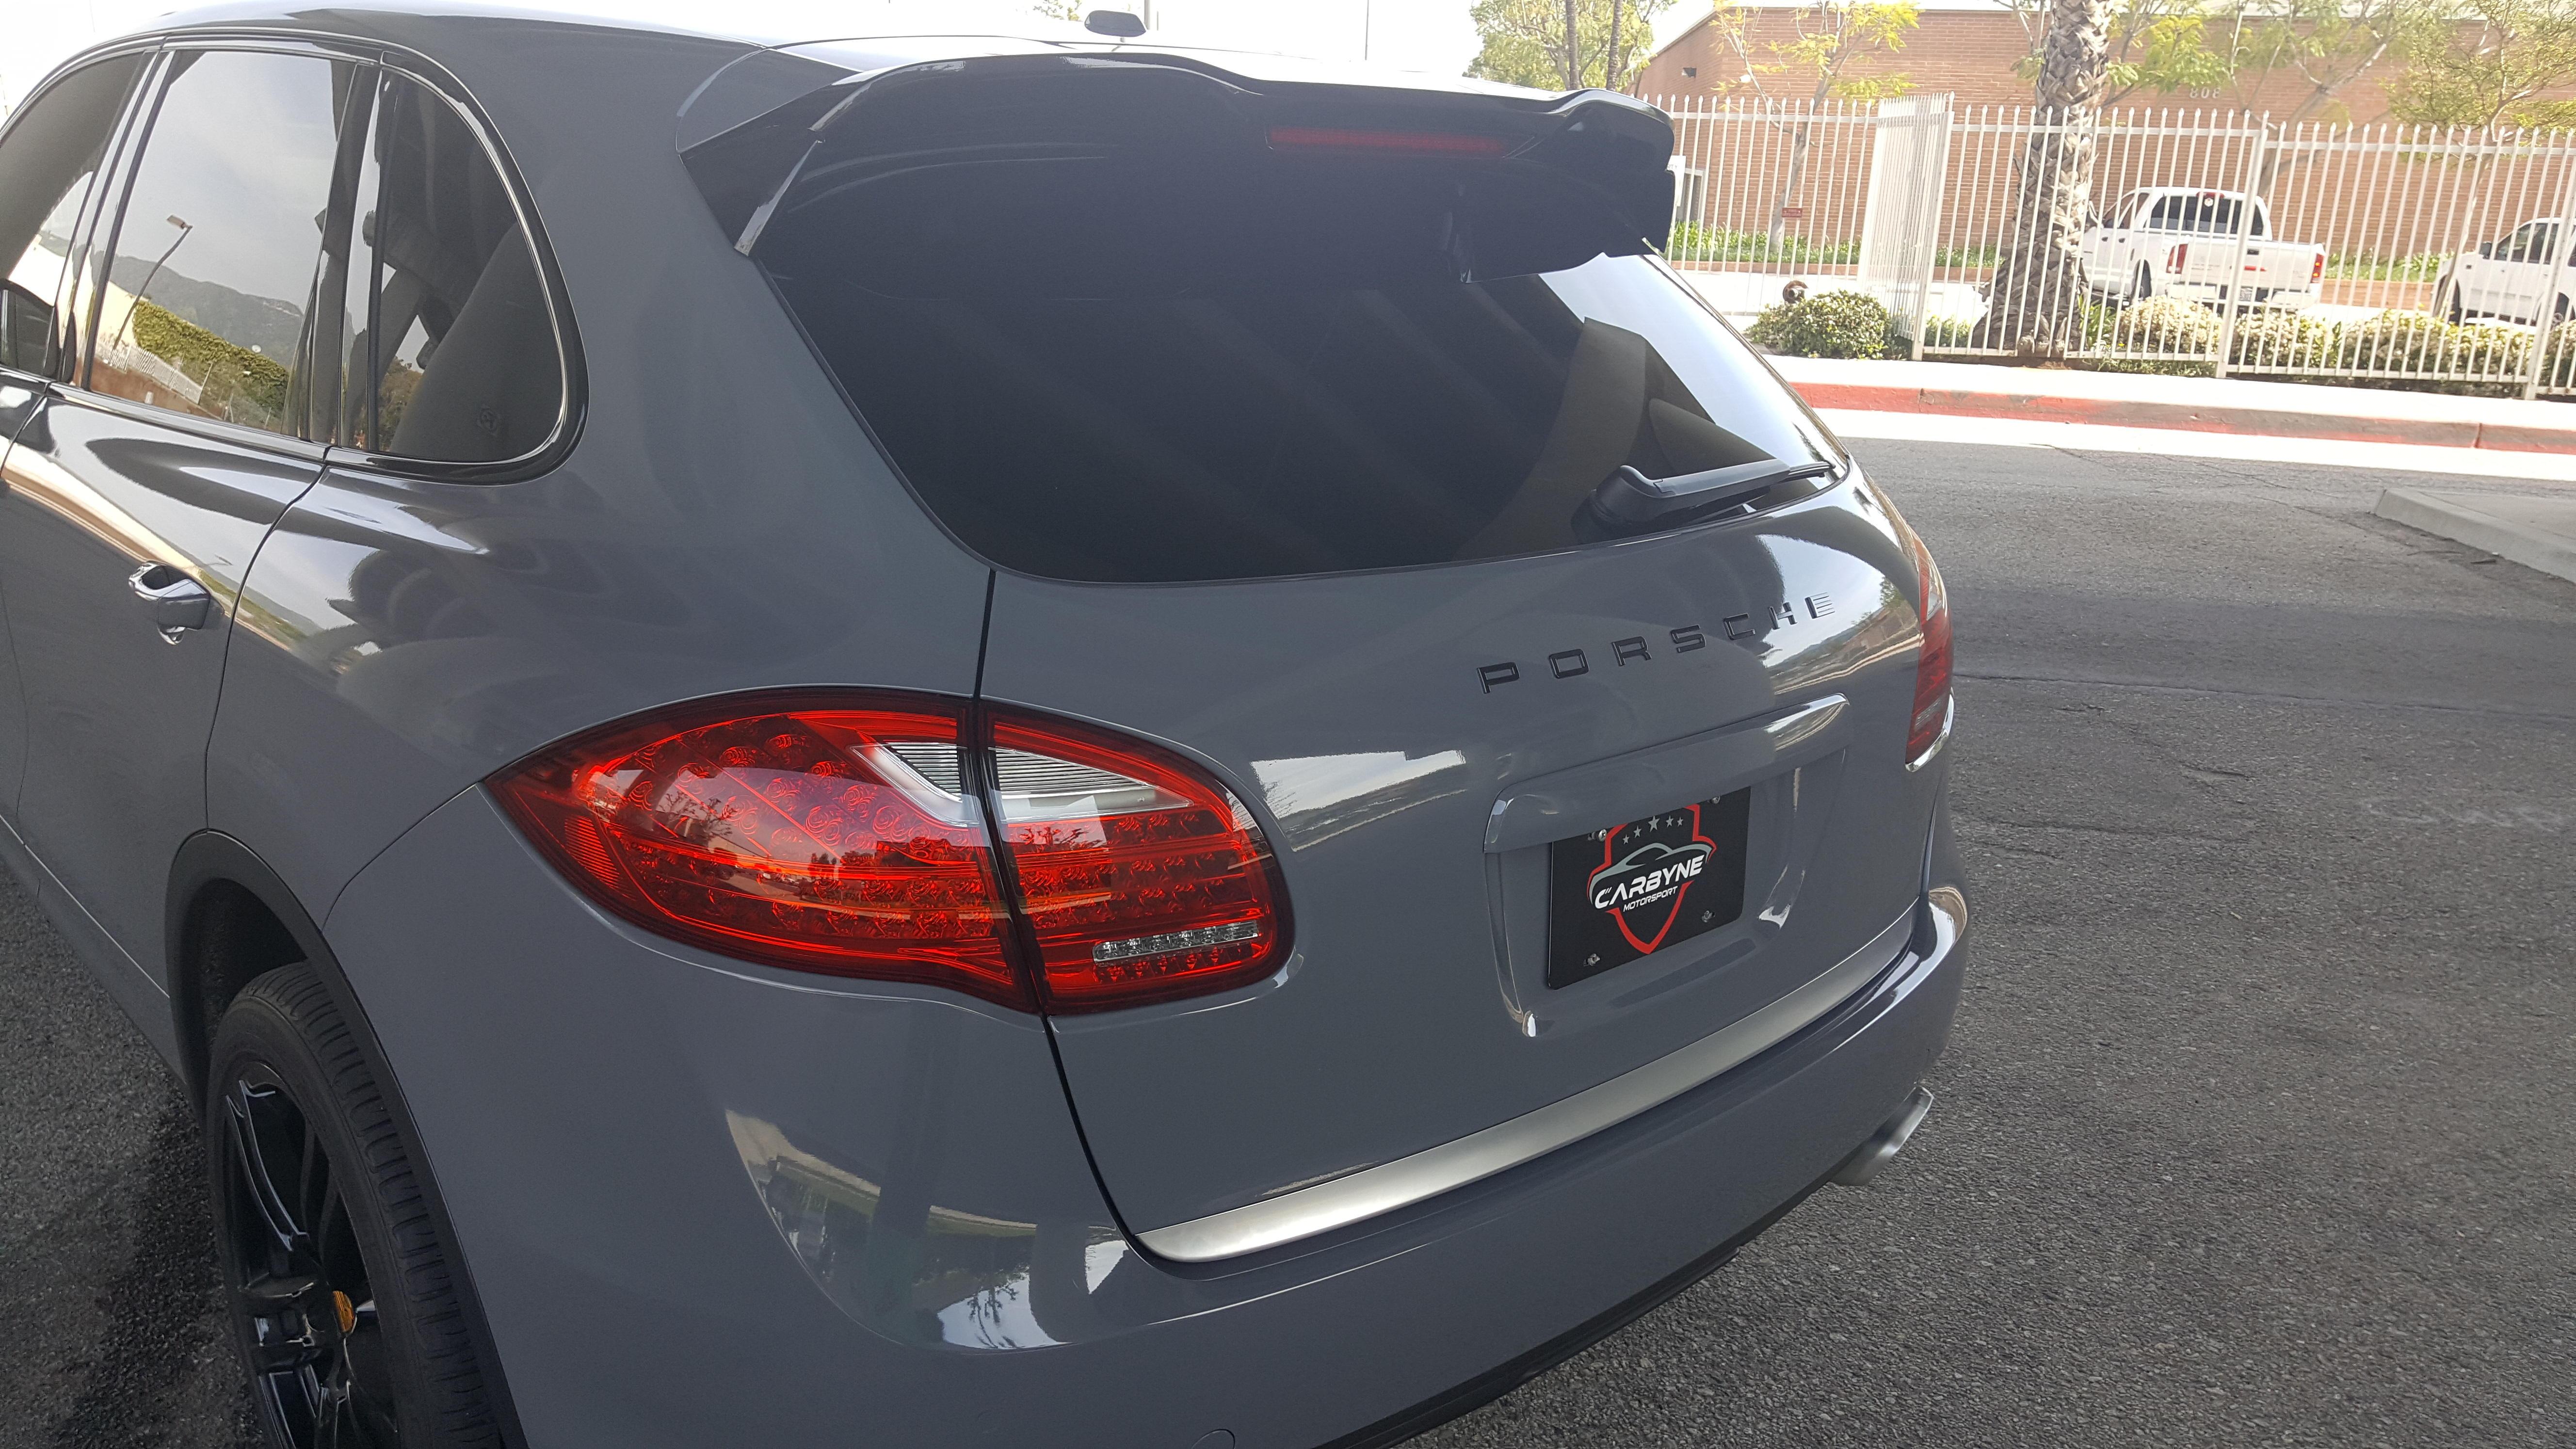 Cash Car Dealerships Near Me >> Carbyne Motorsport Coupons near me in Glendale | 8coupons